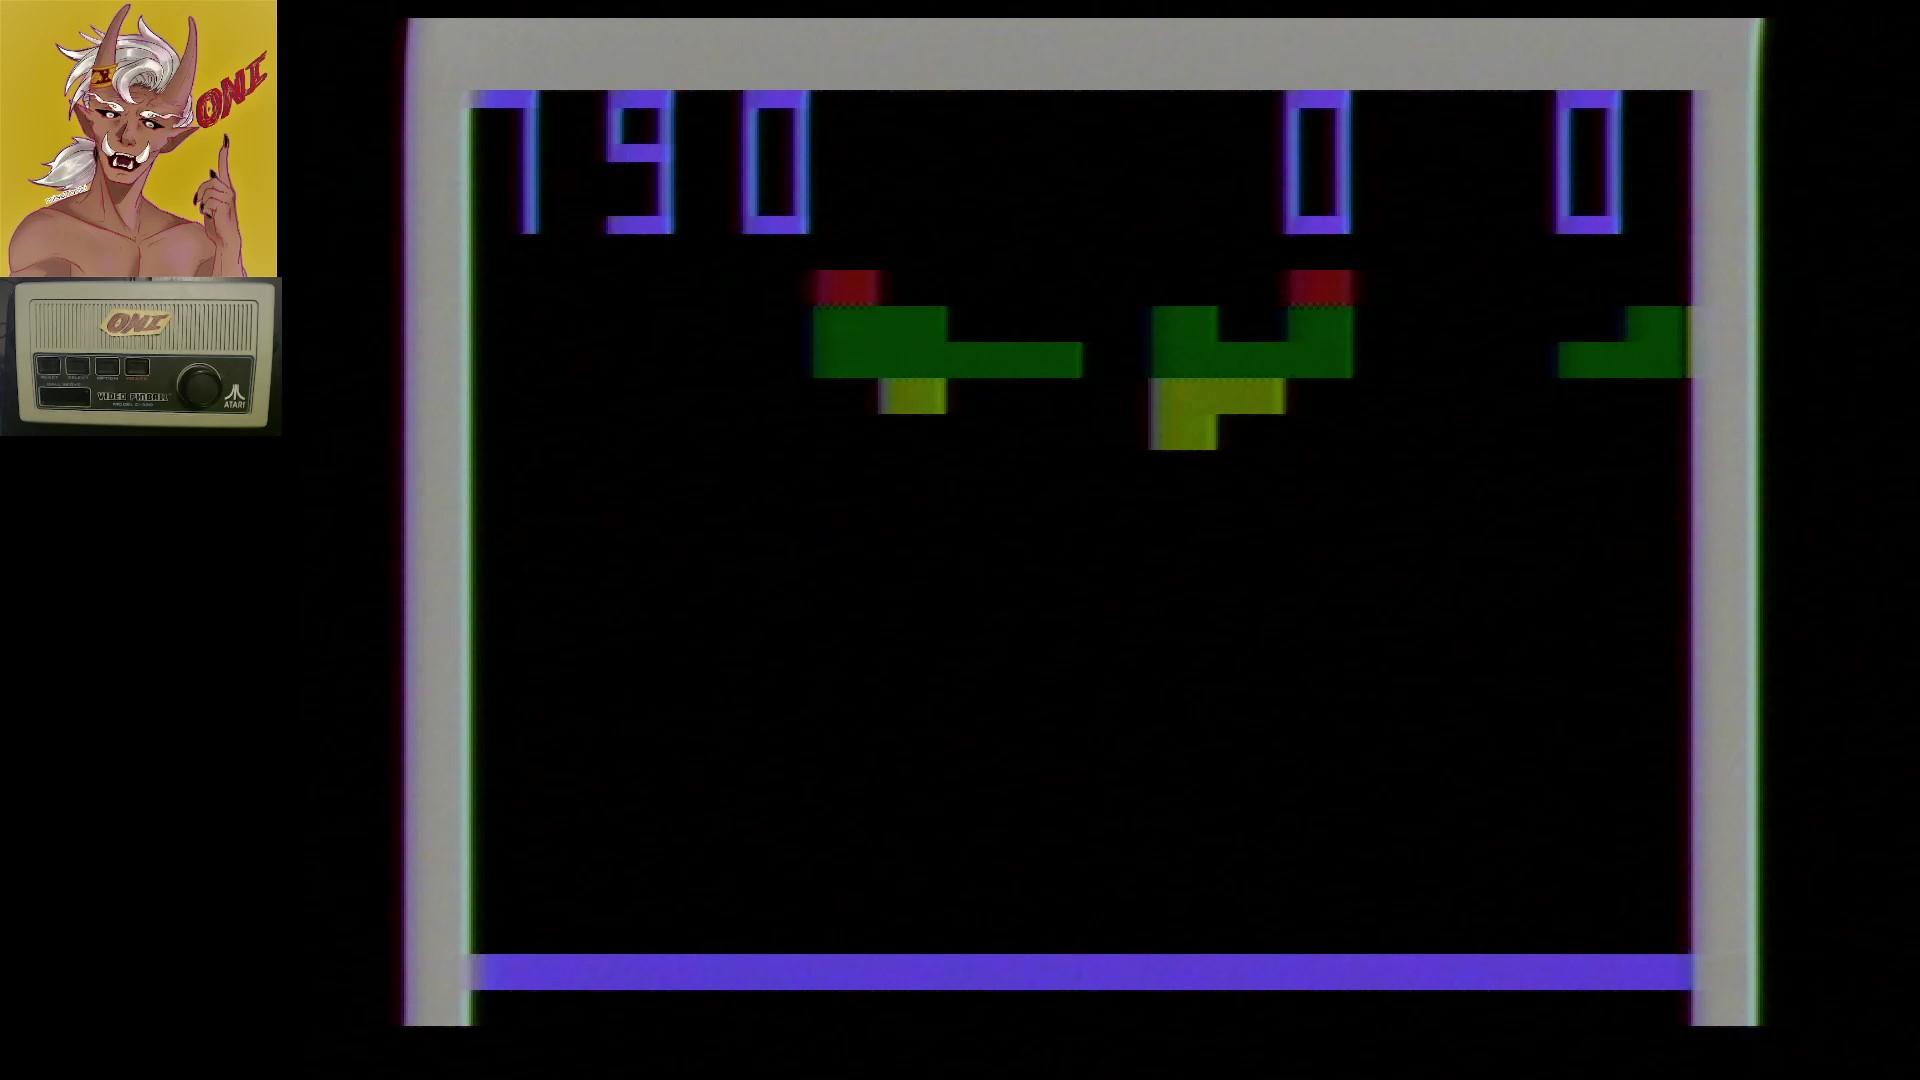 Atari Video Pinball [Model C-380]: Breakout 790 points